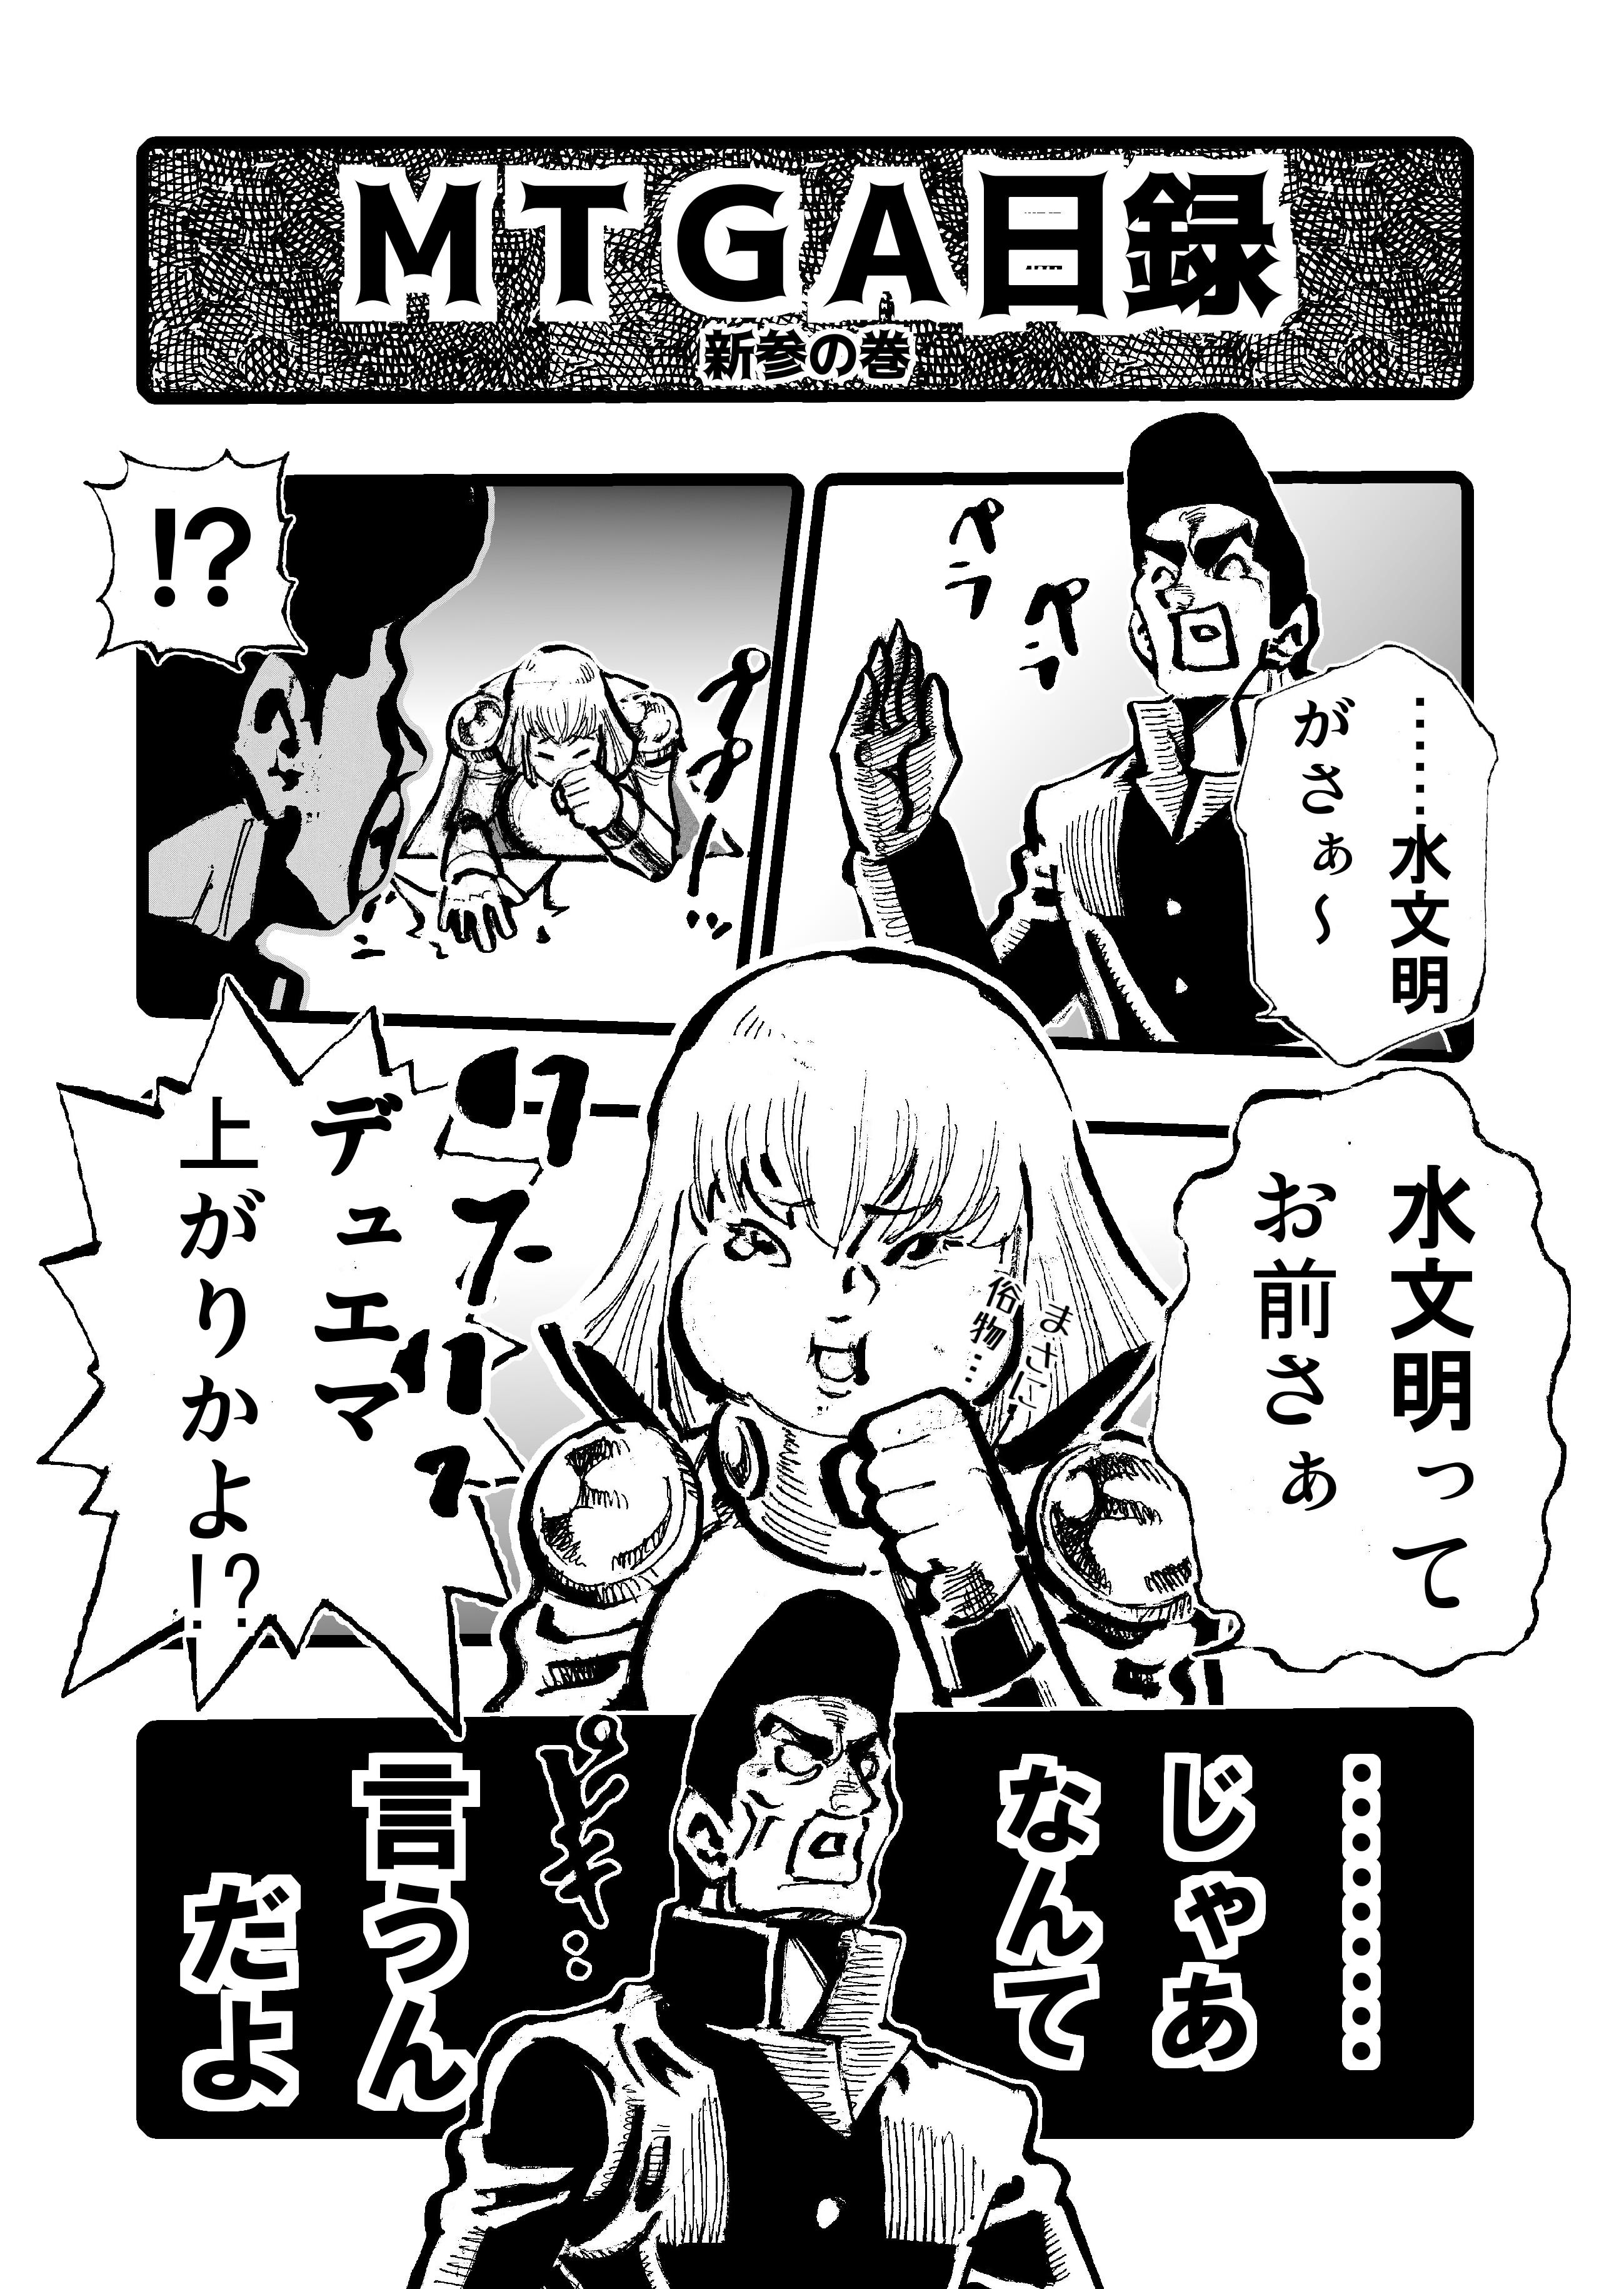 MTGアリーナ日録3 新参の巻